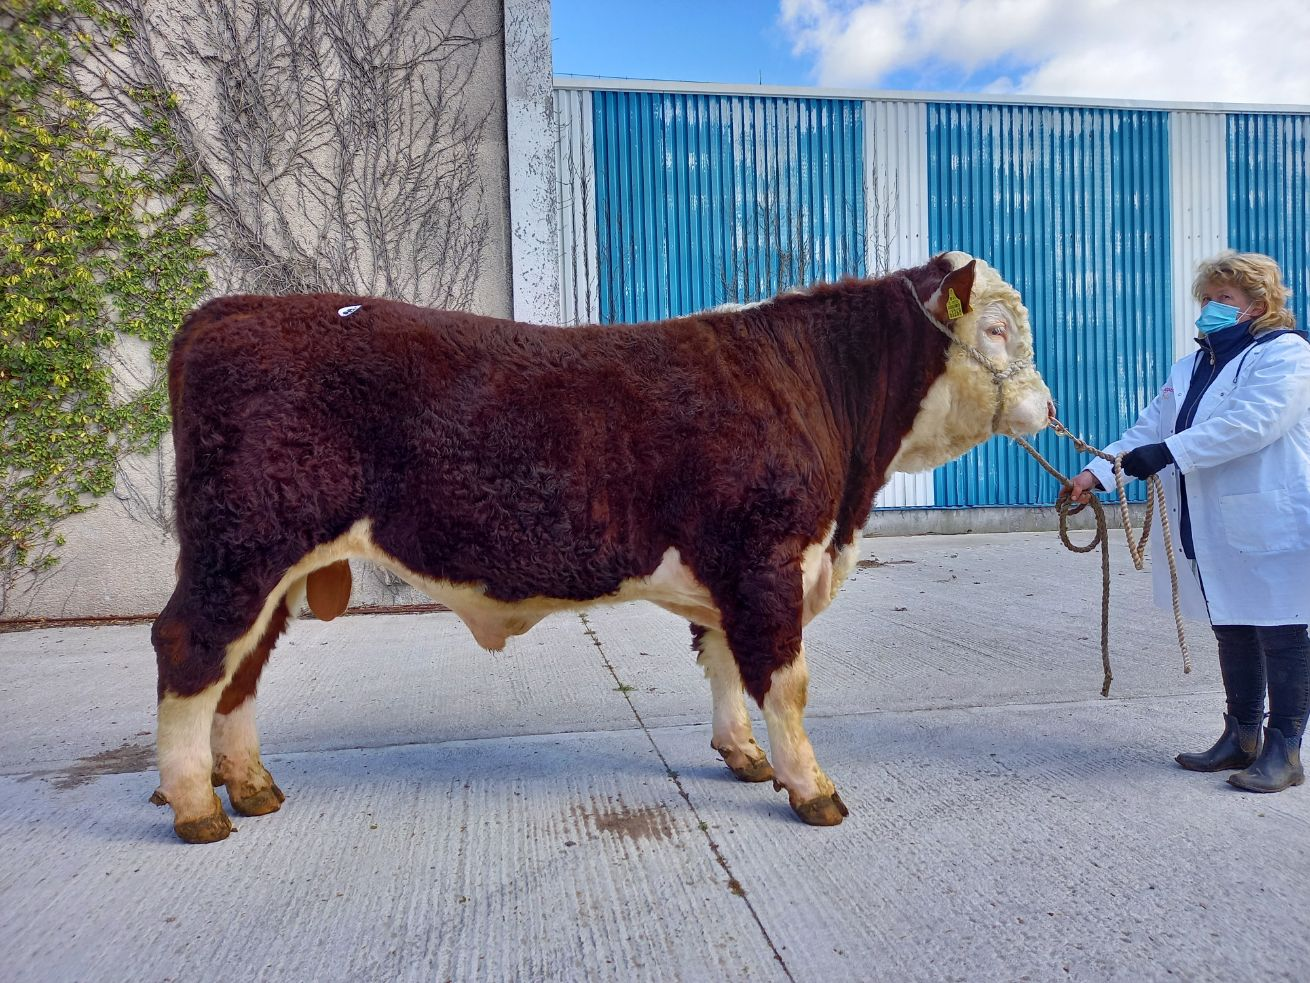 Ballyraggan Upstart 976th, Hereford bull, Nenagh Mart, beef prices